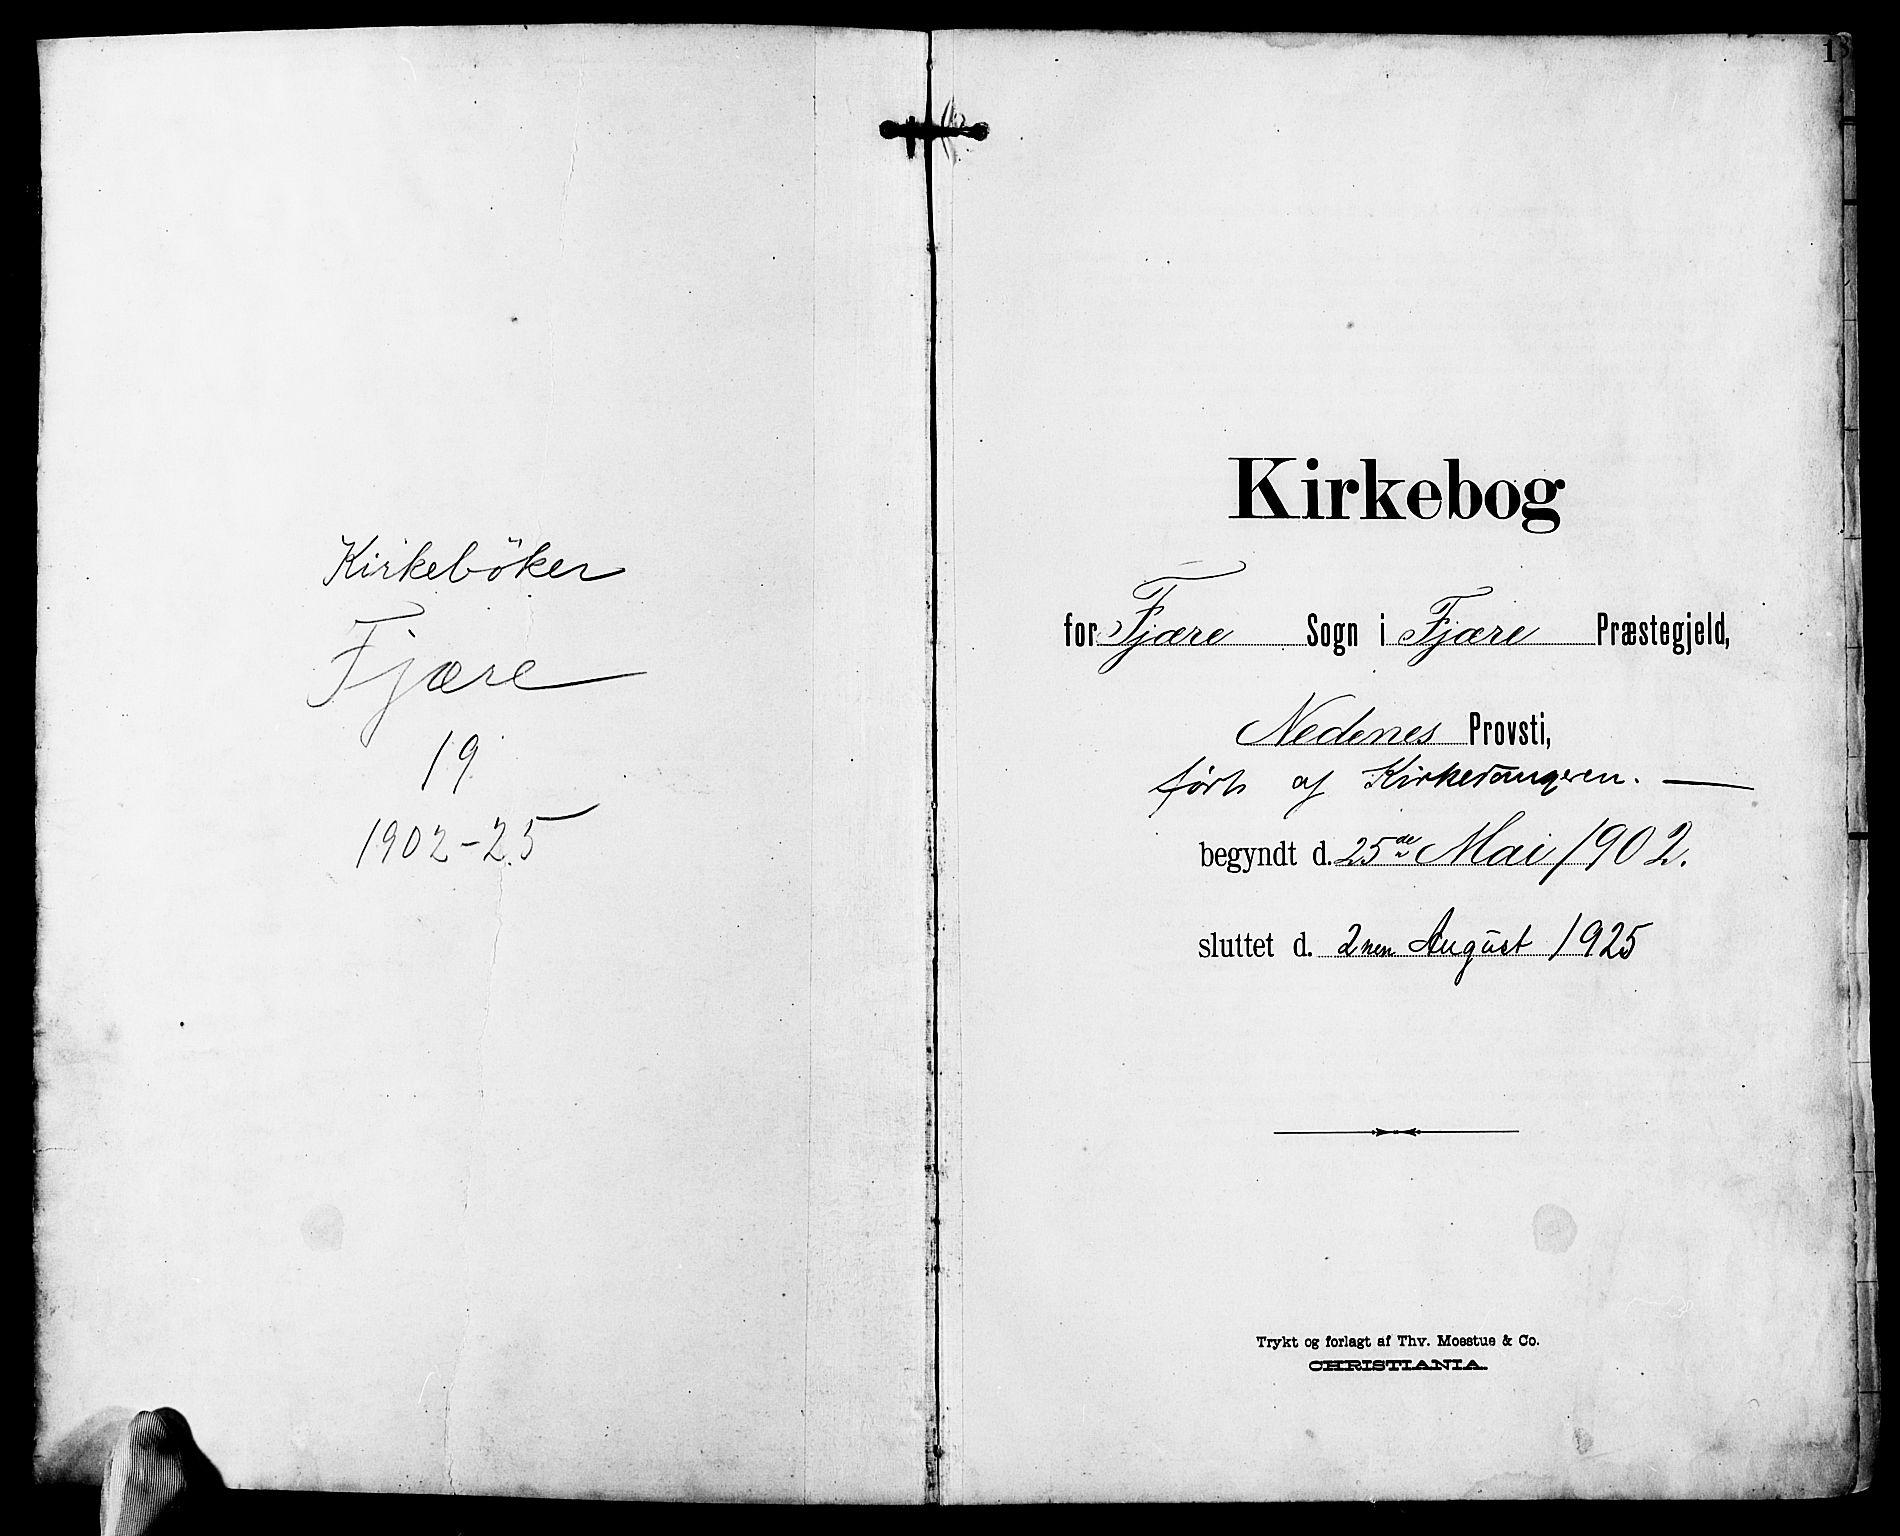 SAK, Fjære sokneprestkontor, F/Fb/L0012: Klokkerbok nr. B 12, 1902-1925, s. 1